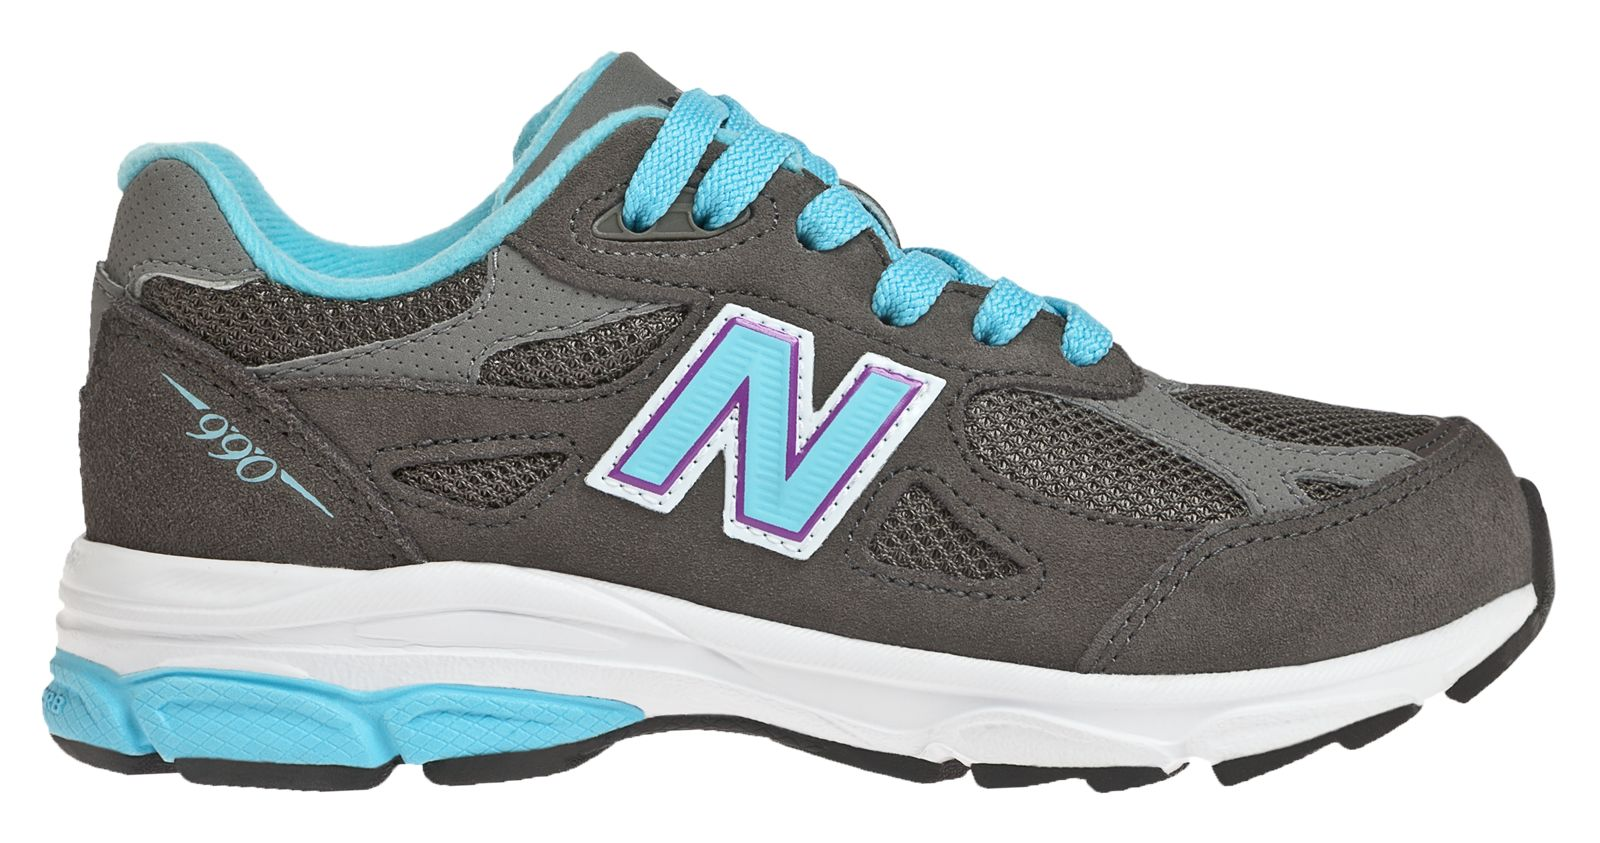 New Balance Neon 990v 3 Pre - school Girls Shoes Grey